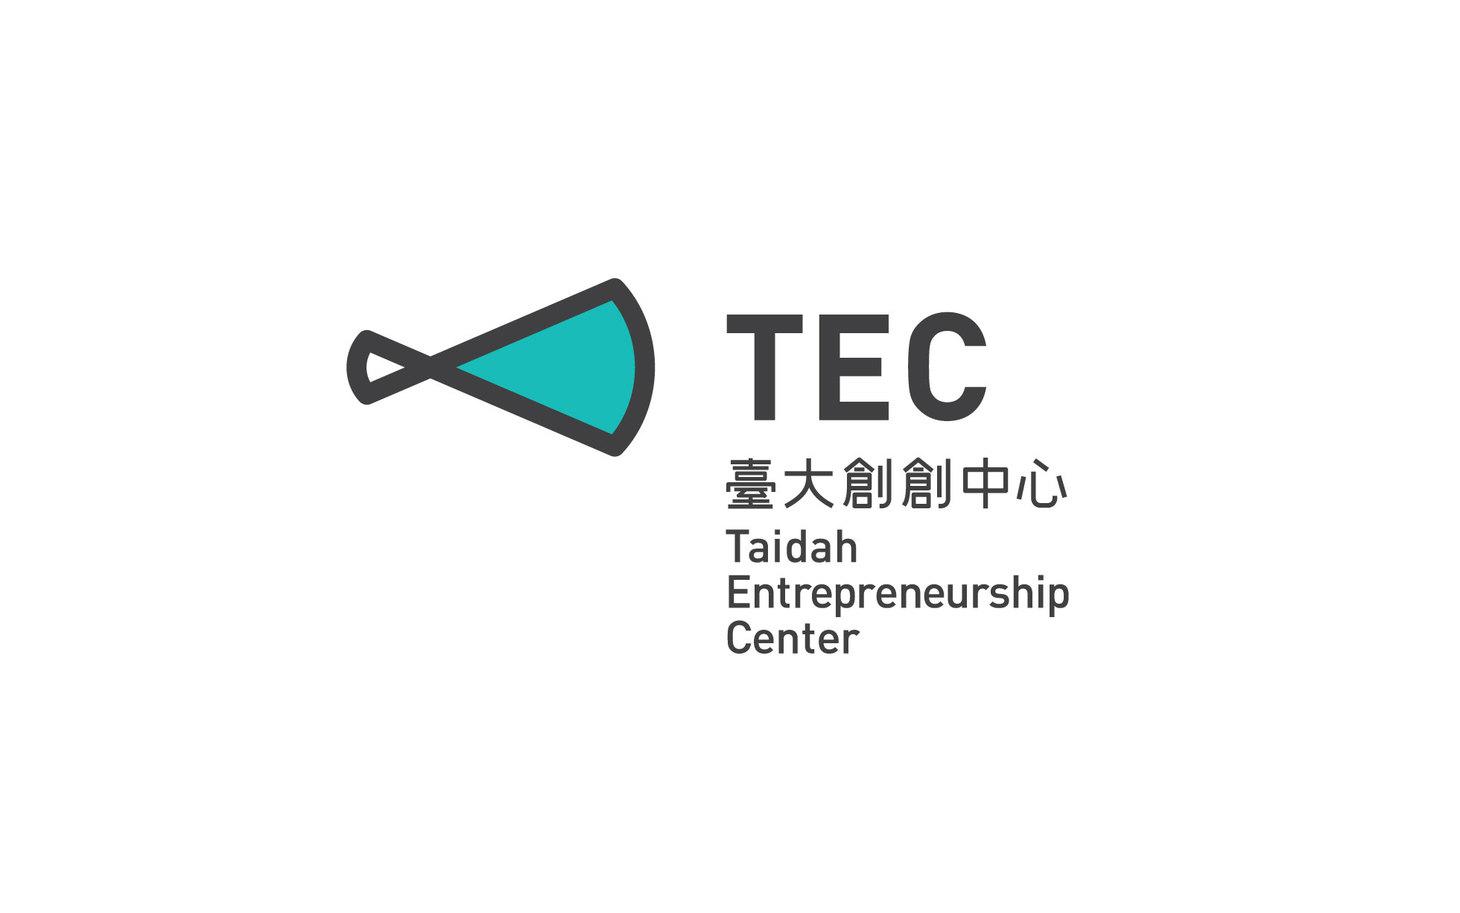 TEC創創中心_logo_20160106_02.jpg